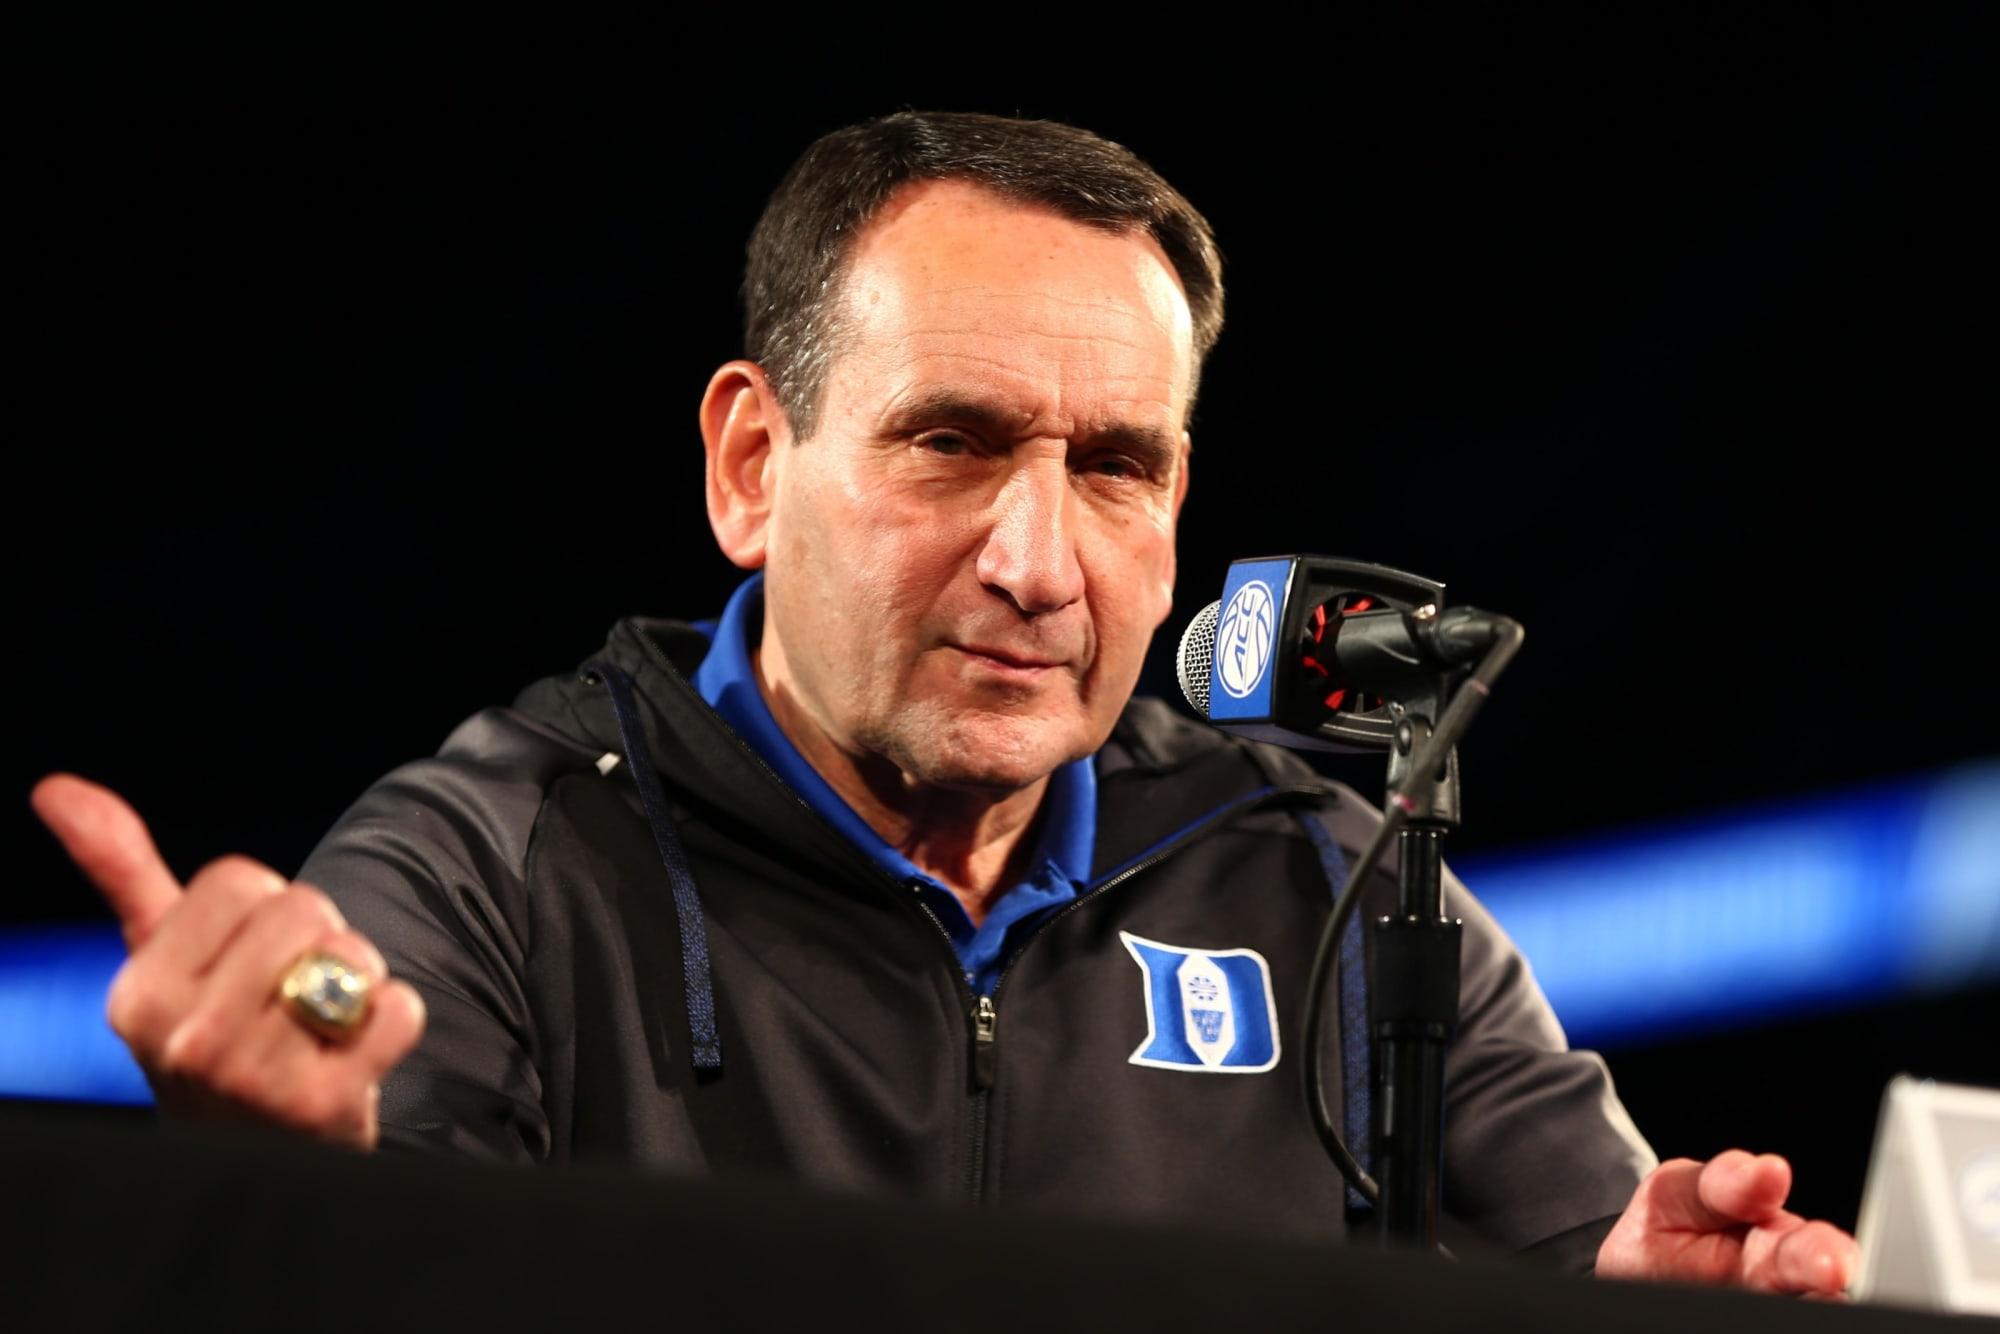 Duke basketball: Coach K ignoring two players too often - Ball Durham